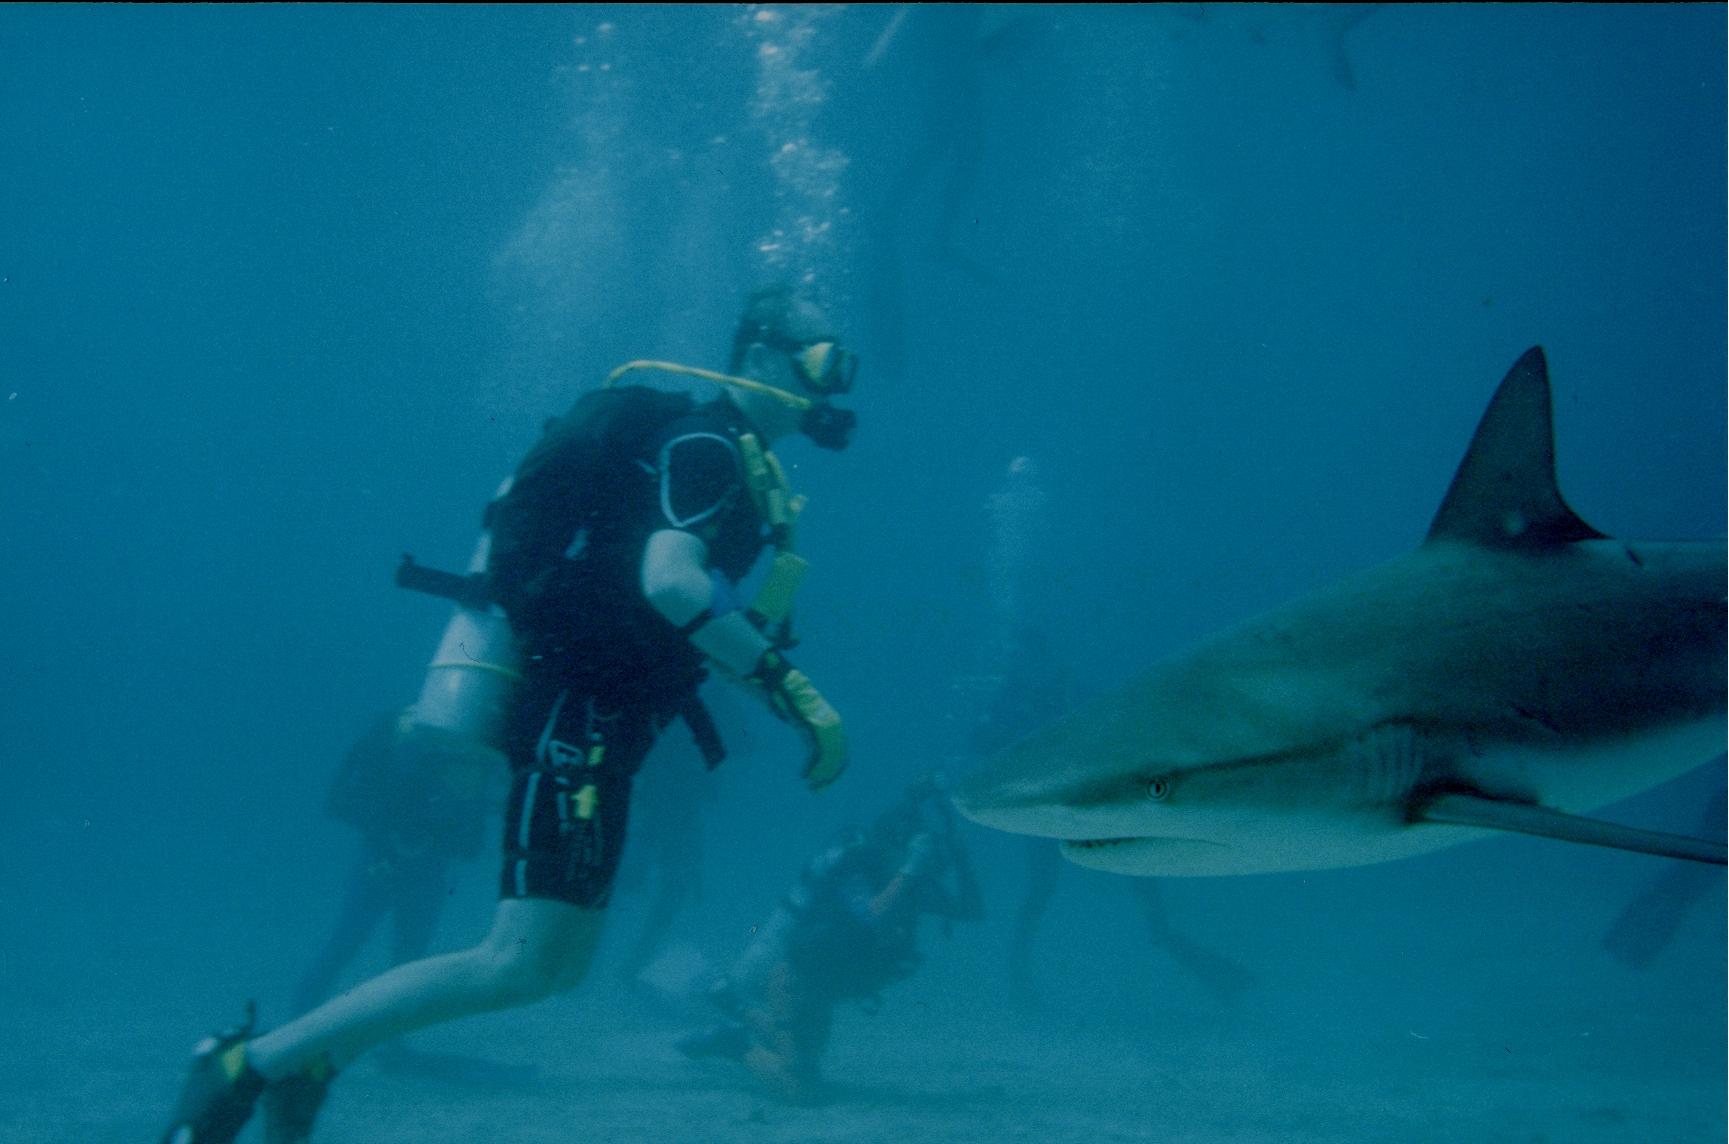 Walker's Cay, Nassau Bahamas, Underwater